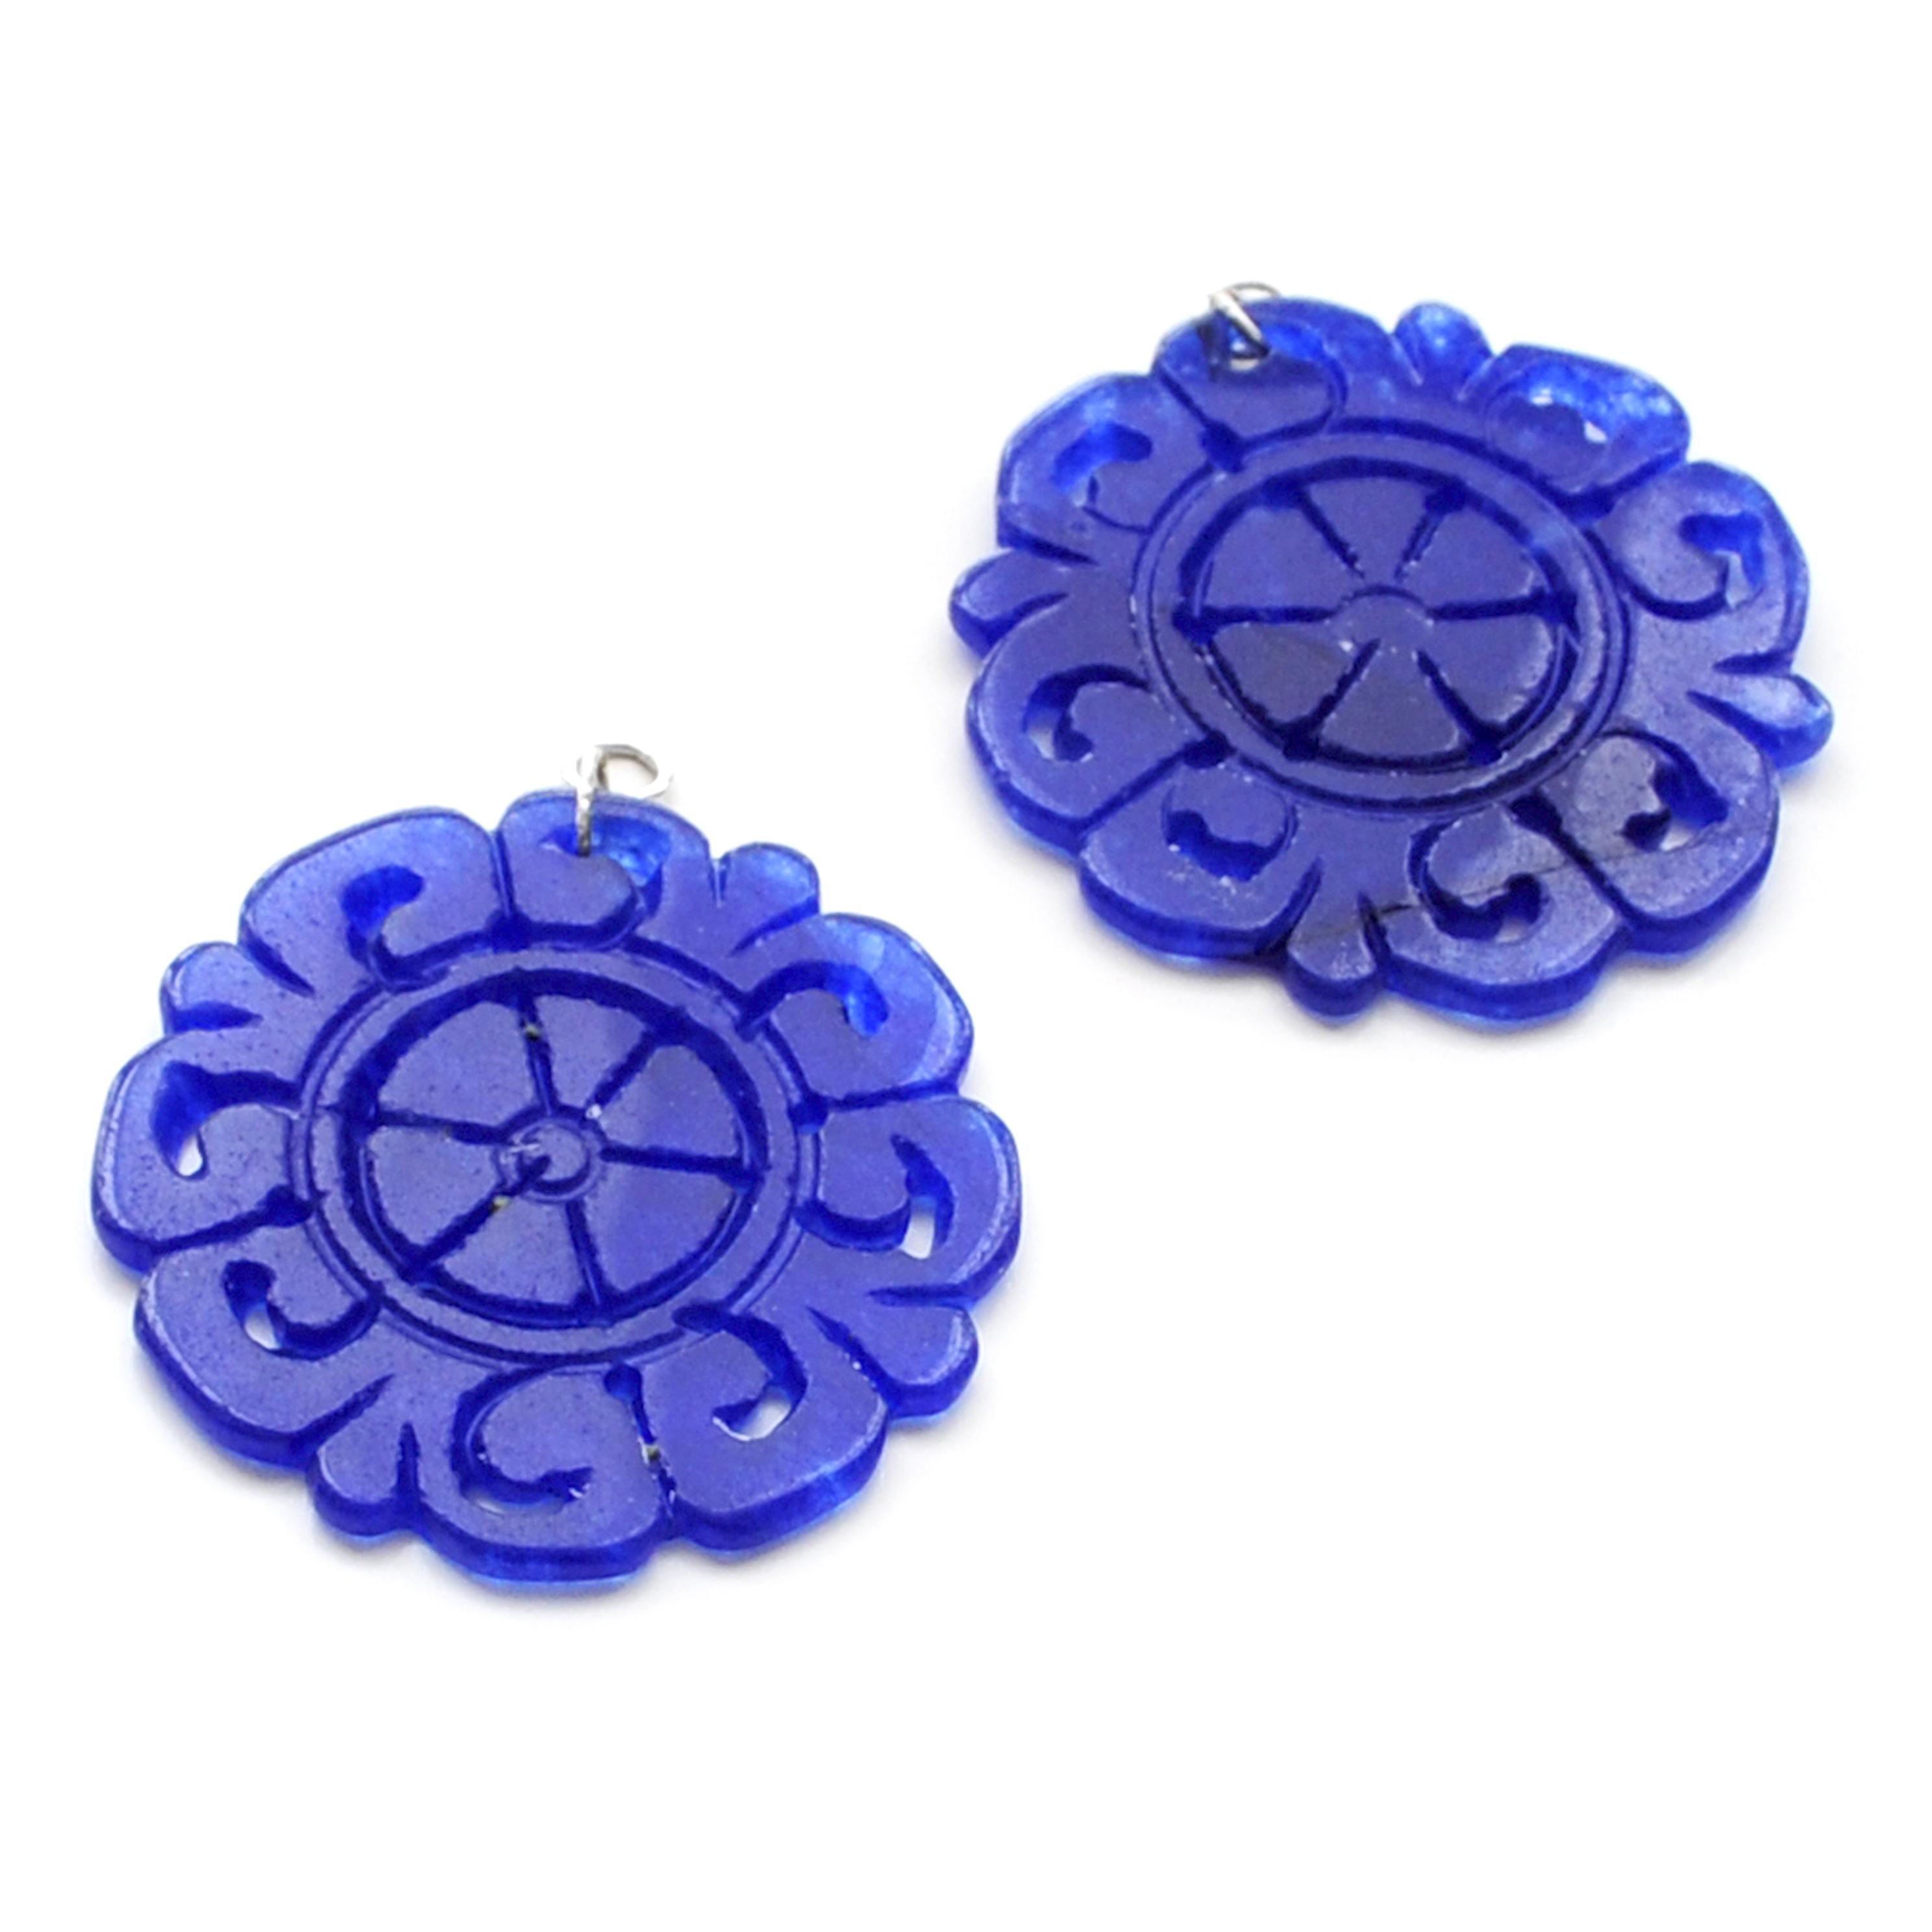 joyeria-true-love-perillas-redondas-jade-azul